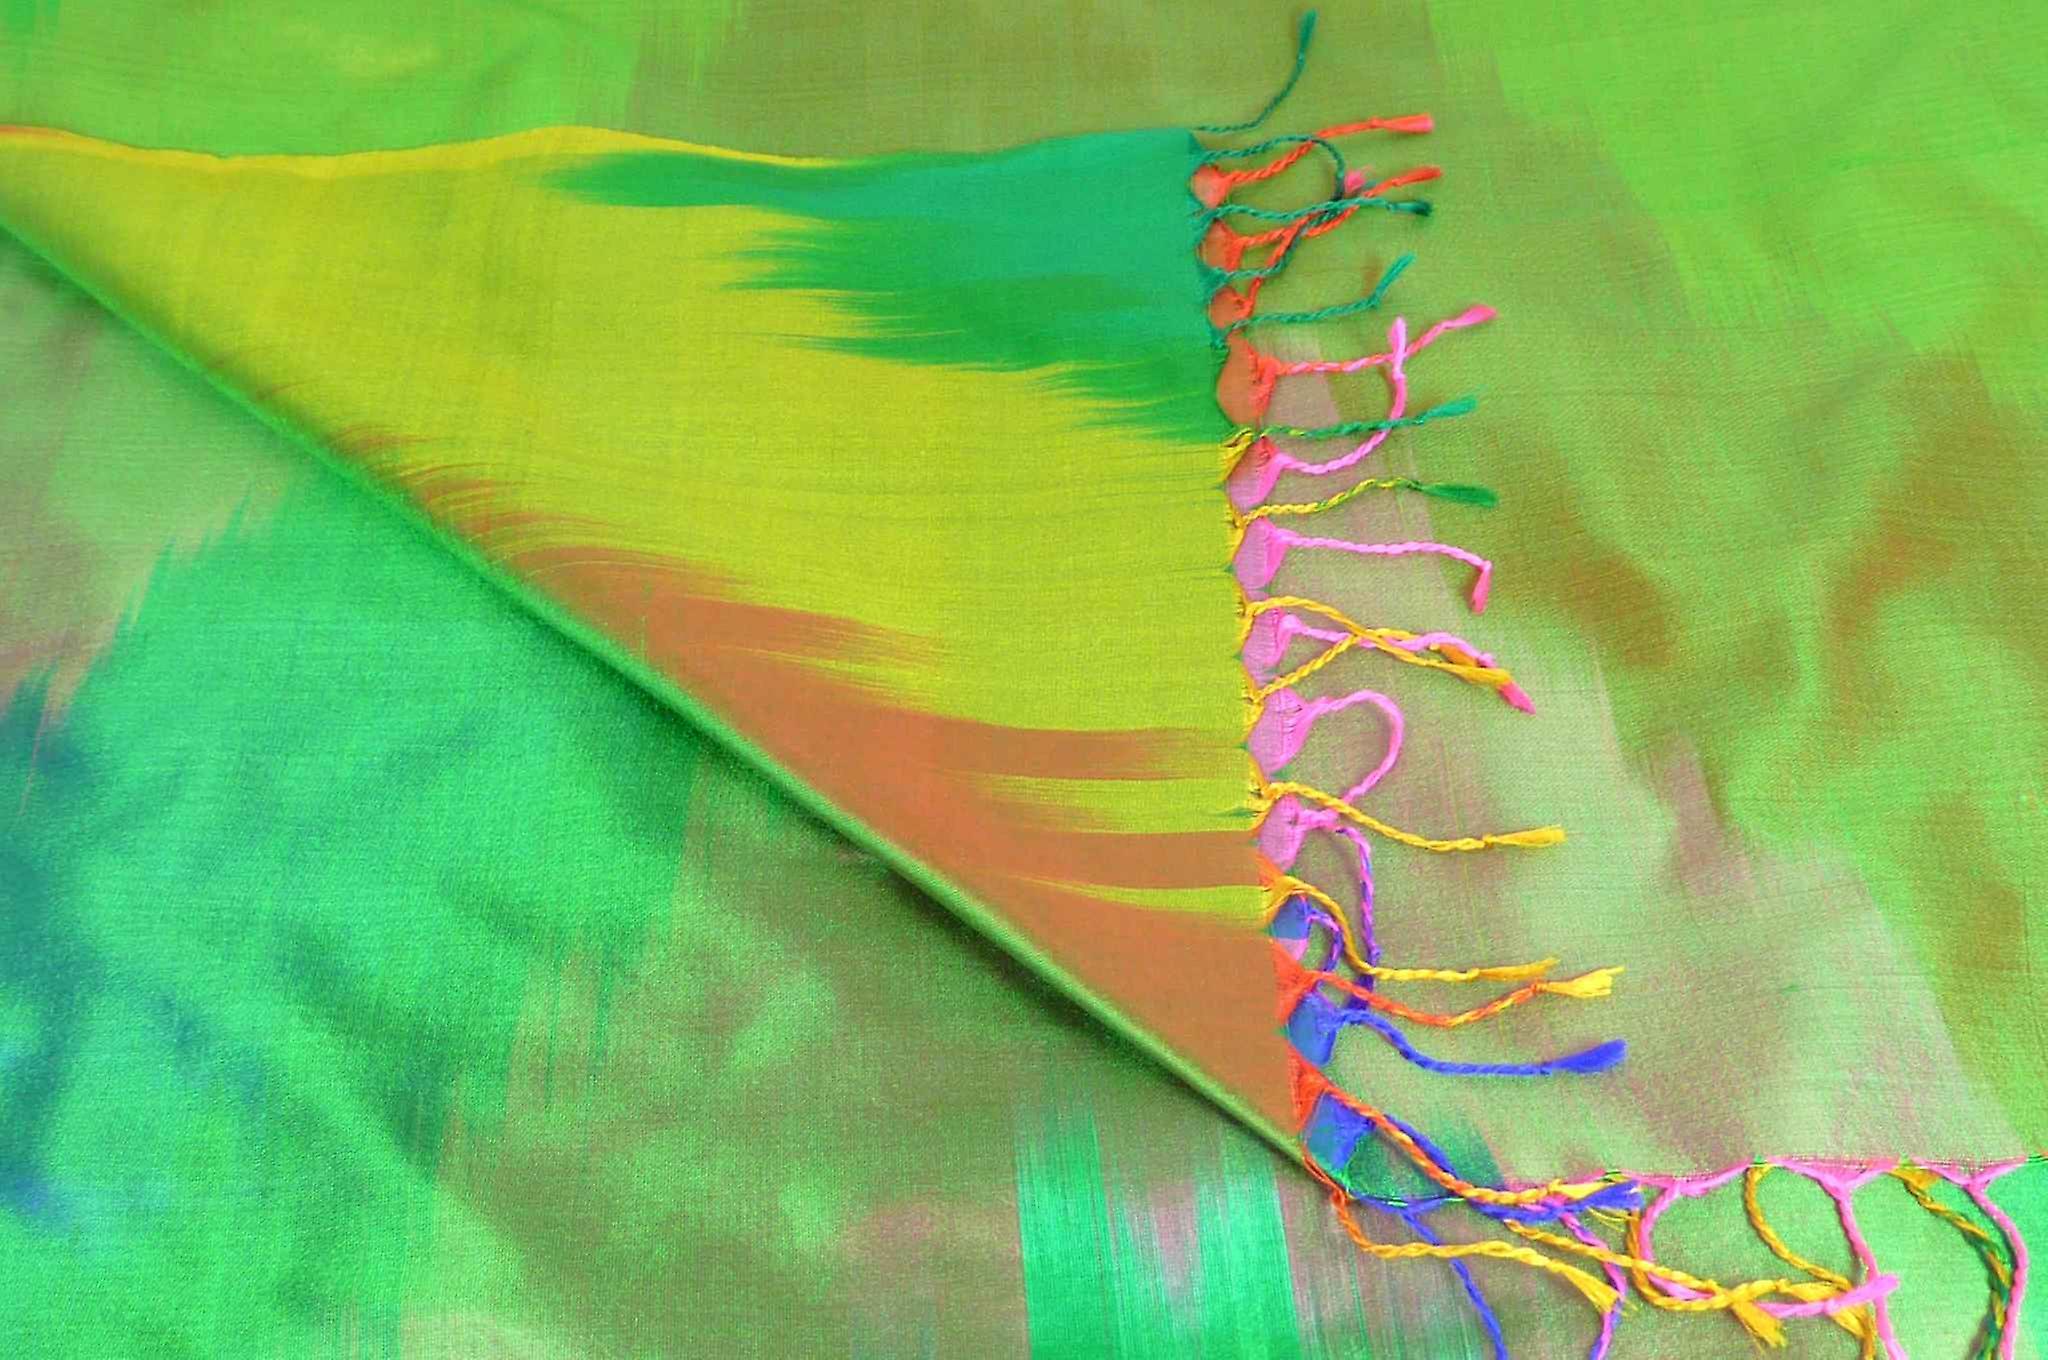 Varanasi Ekal Premium Silk Long Scarf Heritage Range Batra 7 by Pashmina & Silk